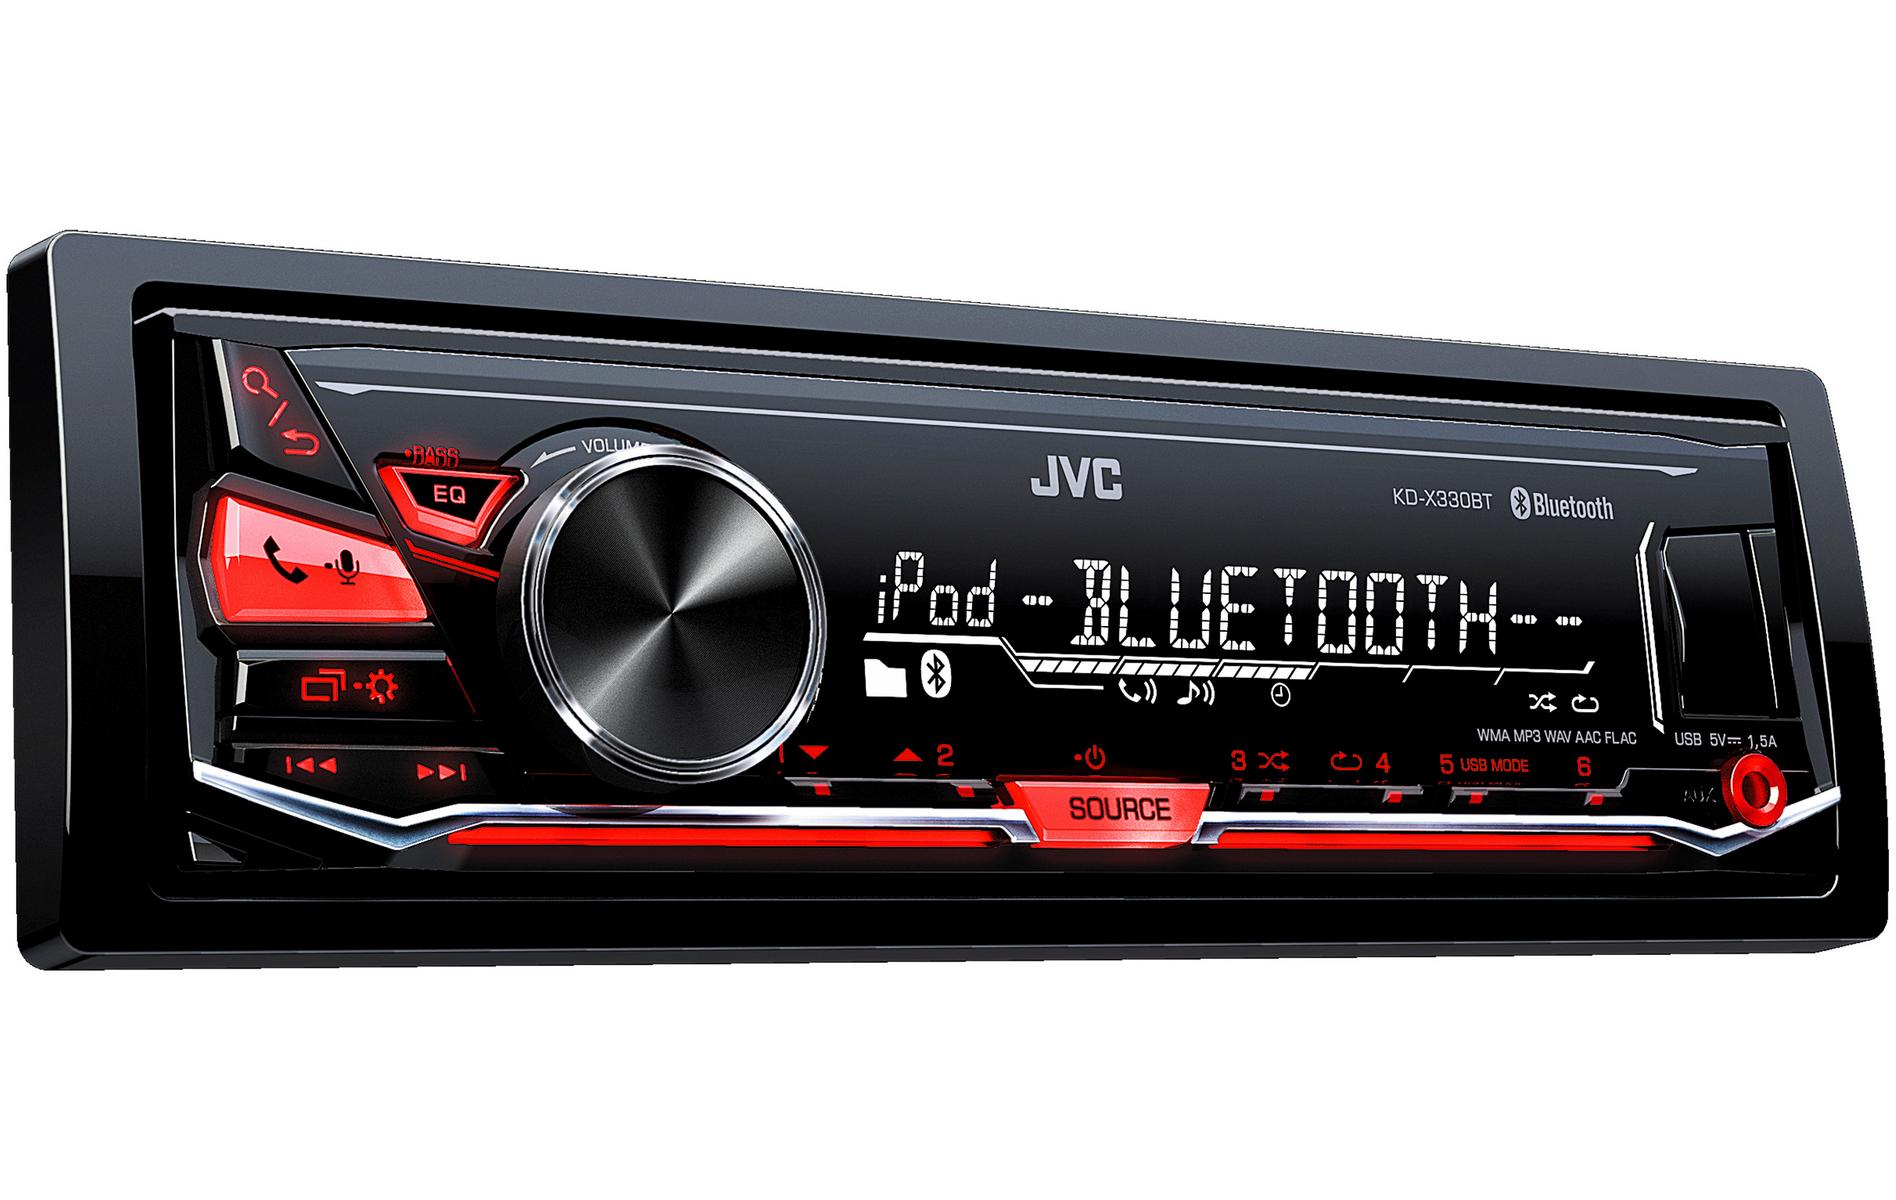 RADIO JVC 2016